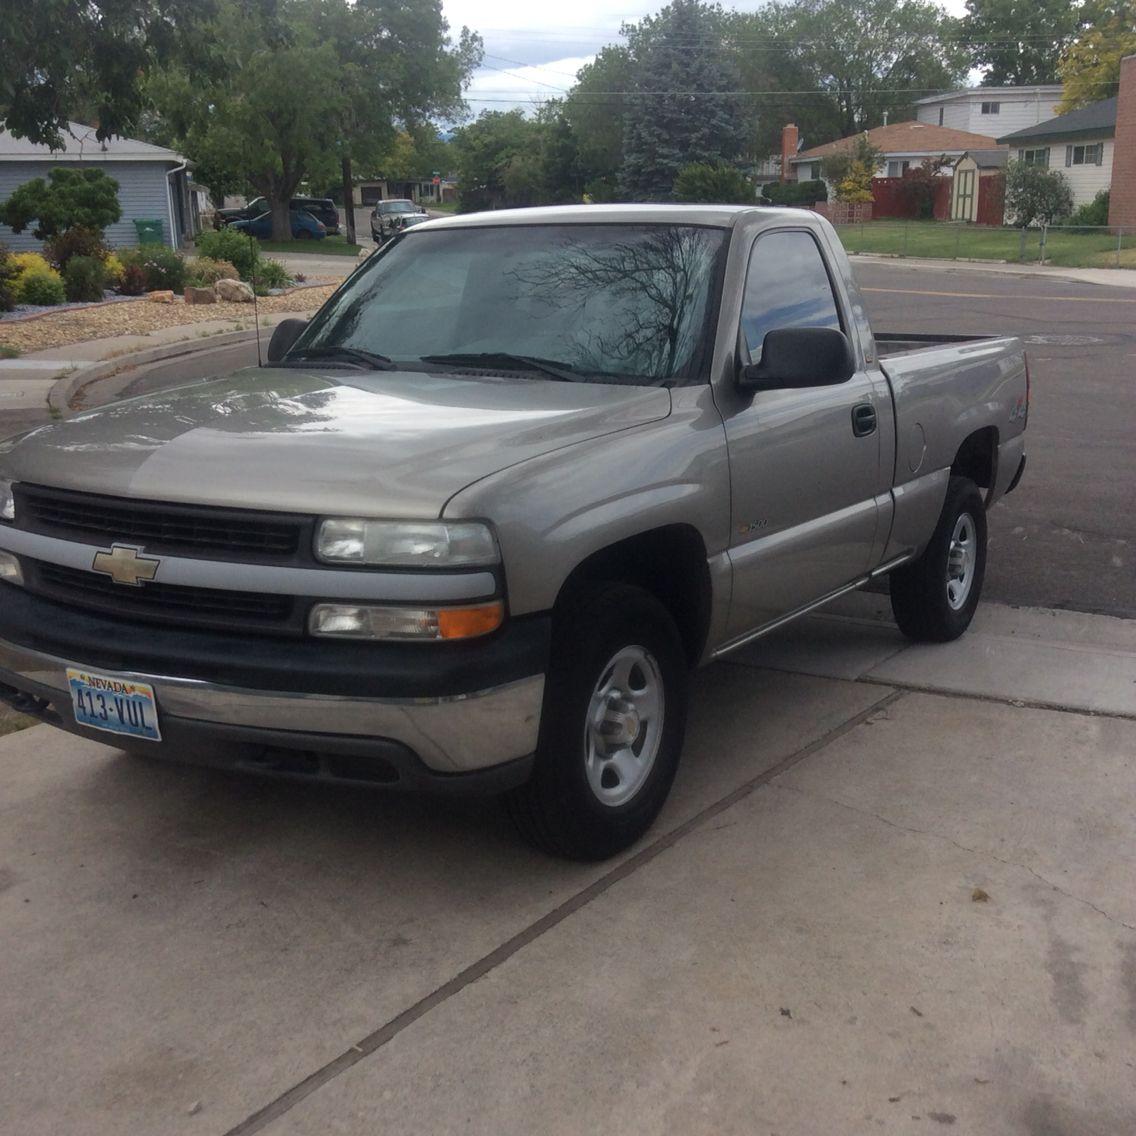 Chevy silverado for sale http reno craigslist org cto